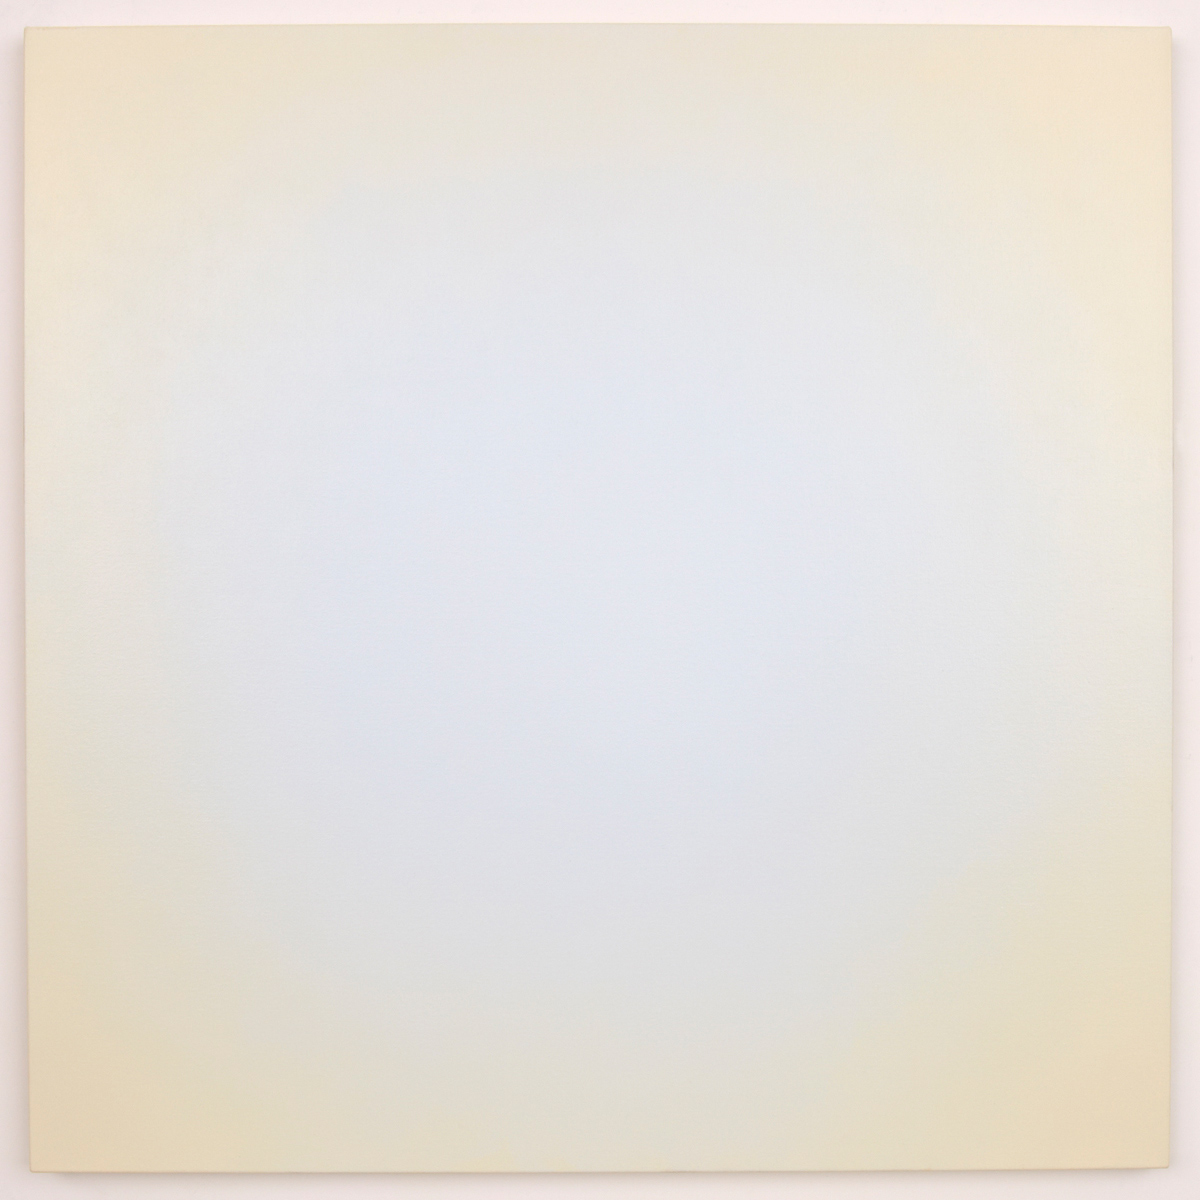 Blue Orange #8 (White/Yellow-Orange), Equivalence Blue Orange Series, 2006, oil on canvas, 48 x 48 in. (122 x 122 cm.)